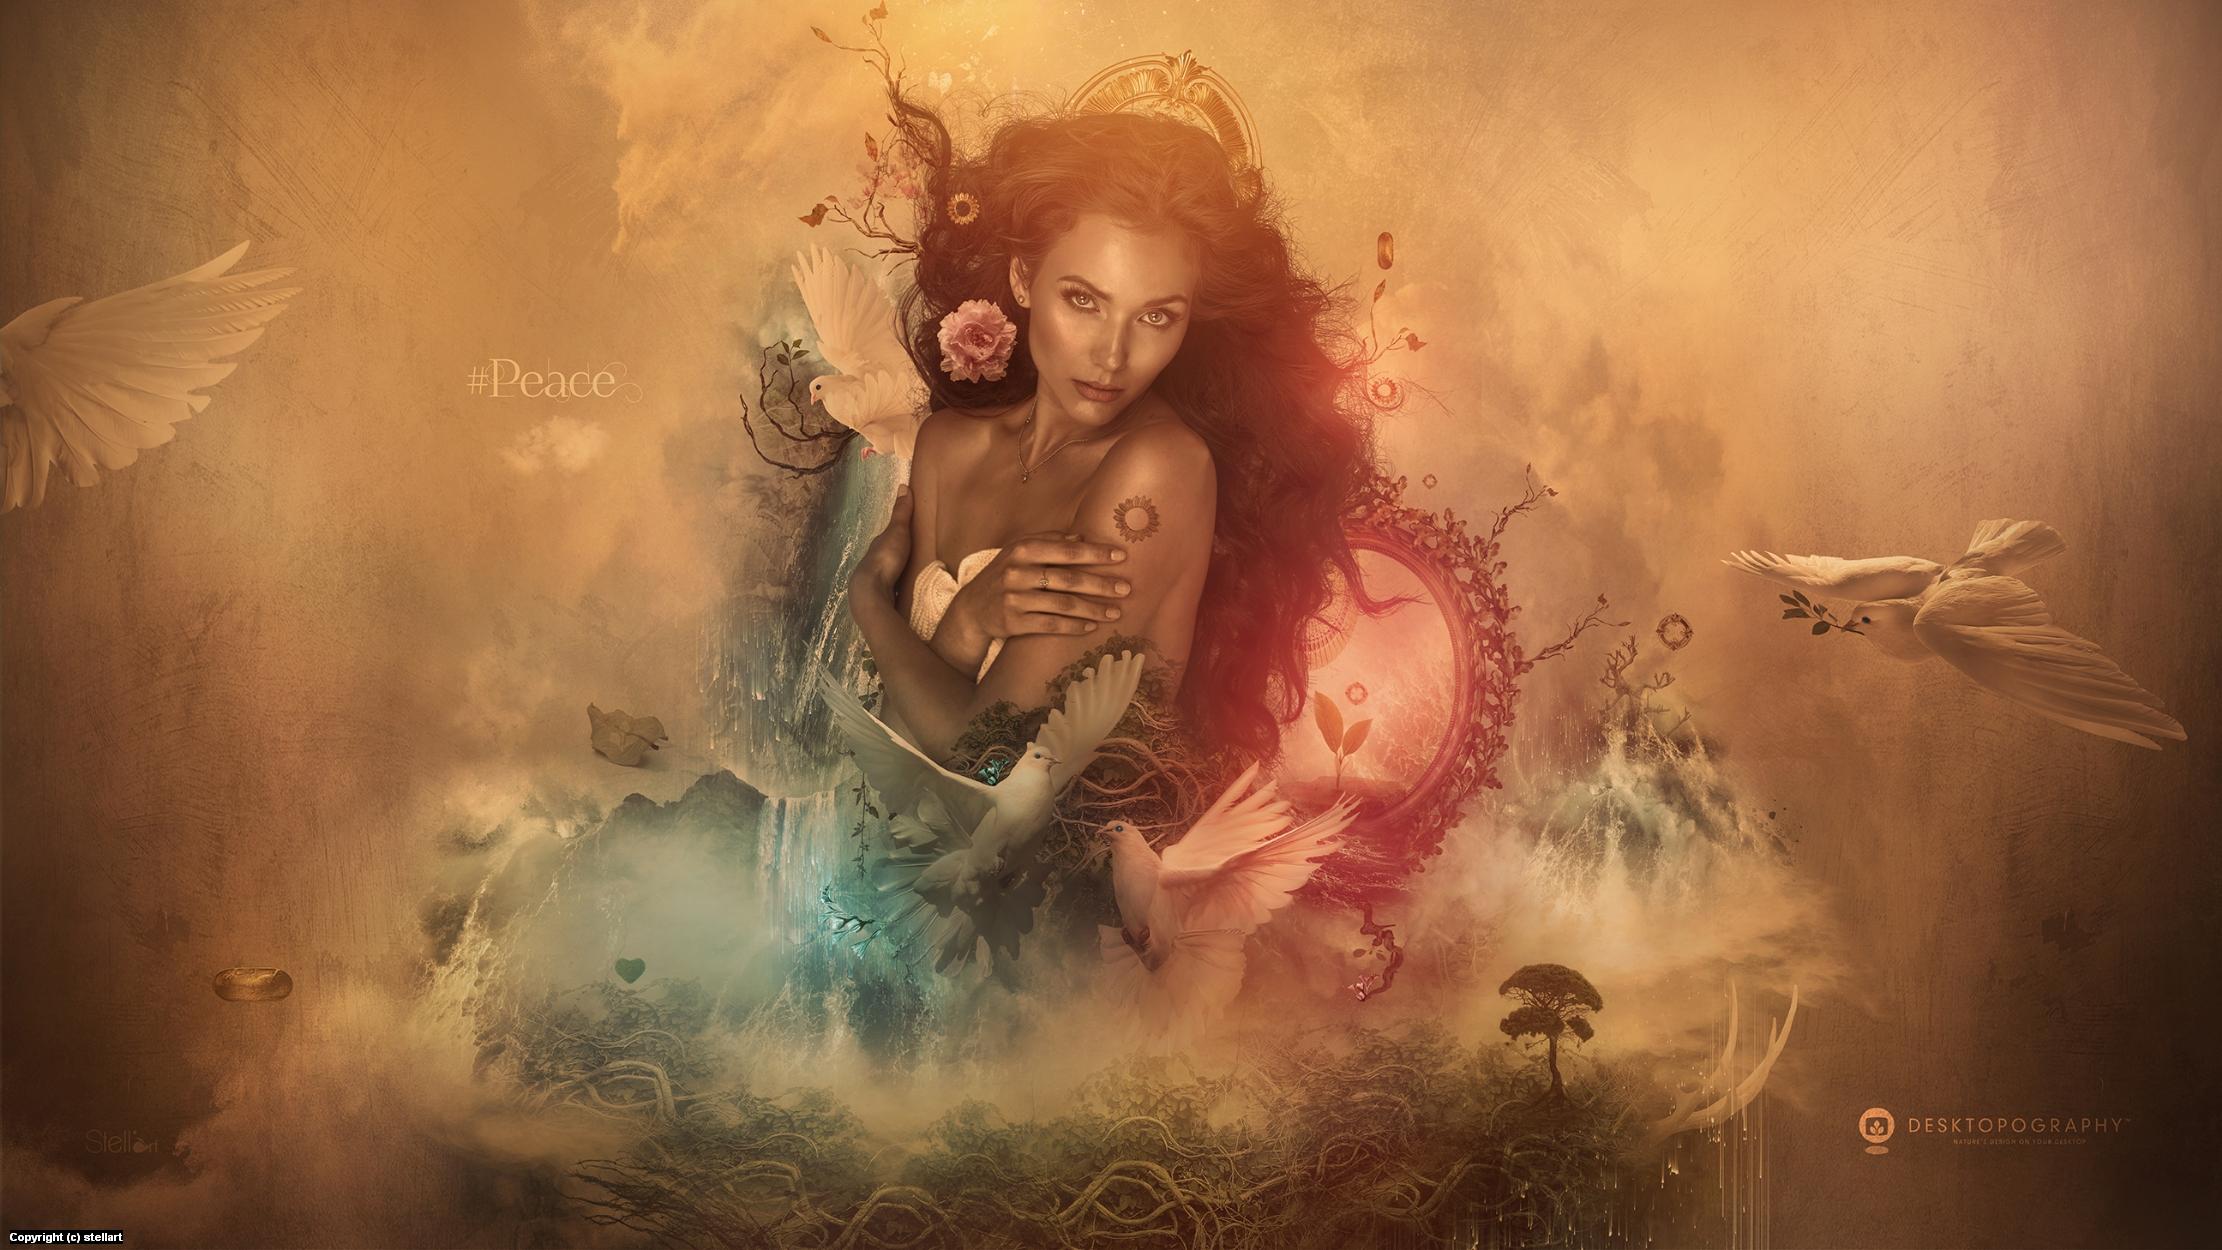 Peace Artwork by Estelle Chomienne